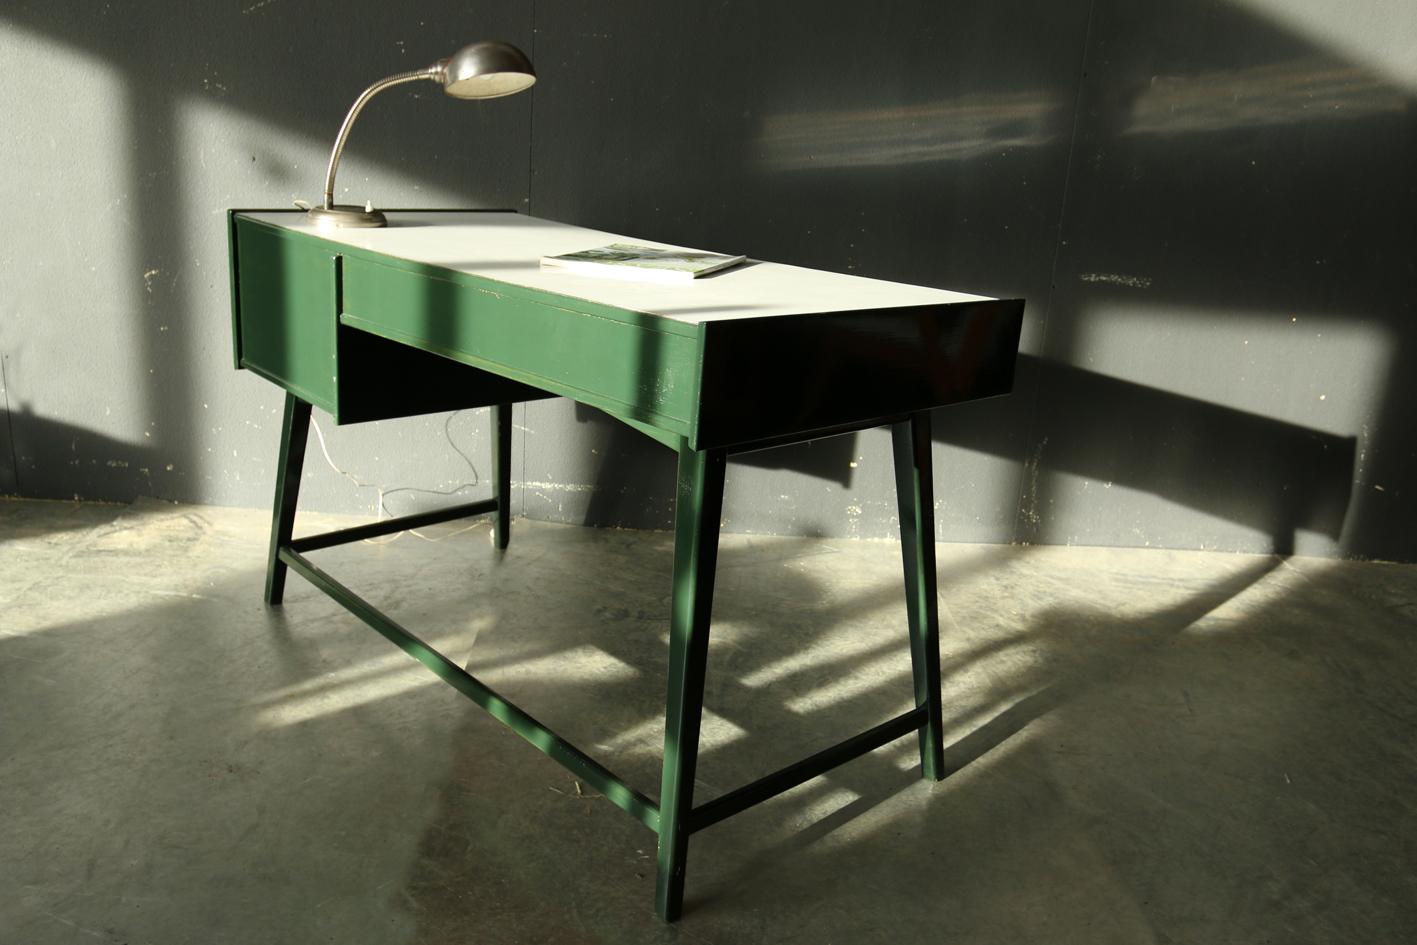 super retro vintage bureau jaren 60 groen wit dehuiszwaluw. Black Bedroom Furniture Sets. Home Design Ideas